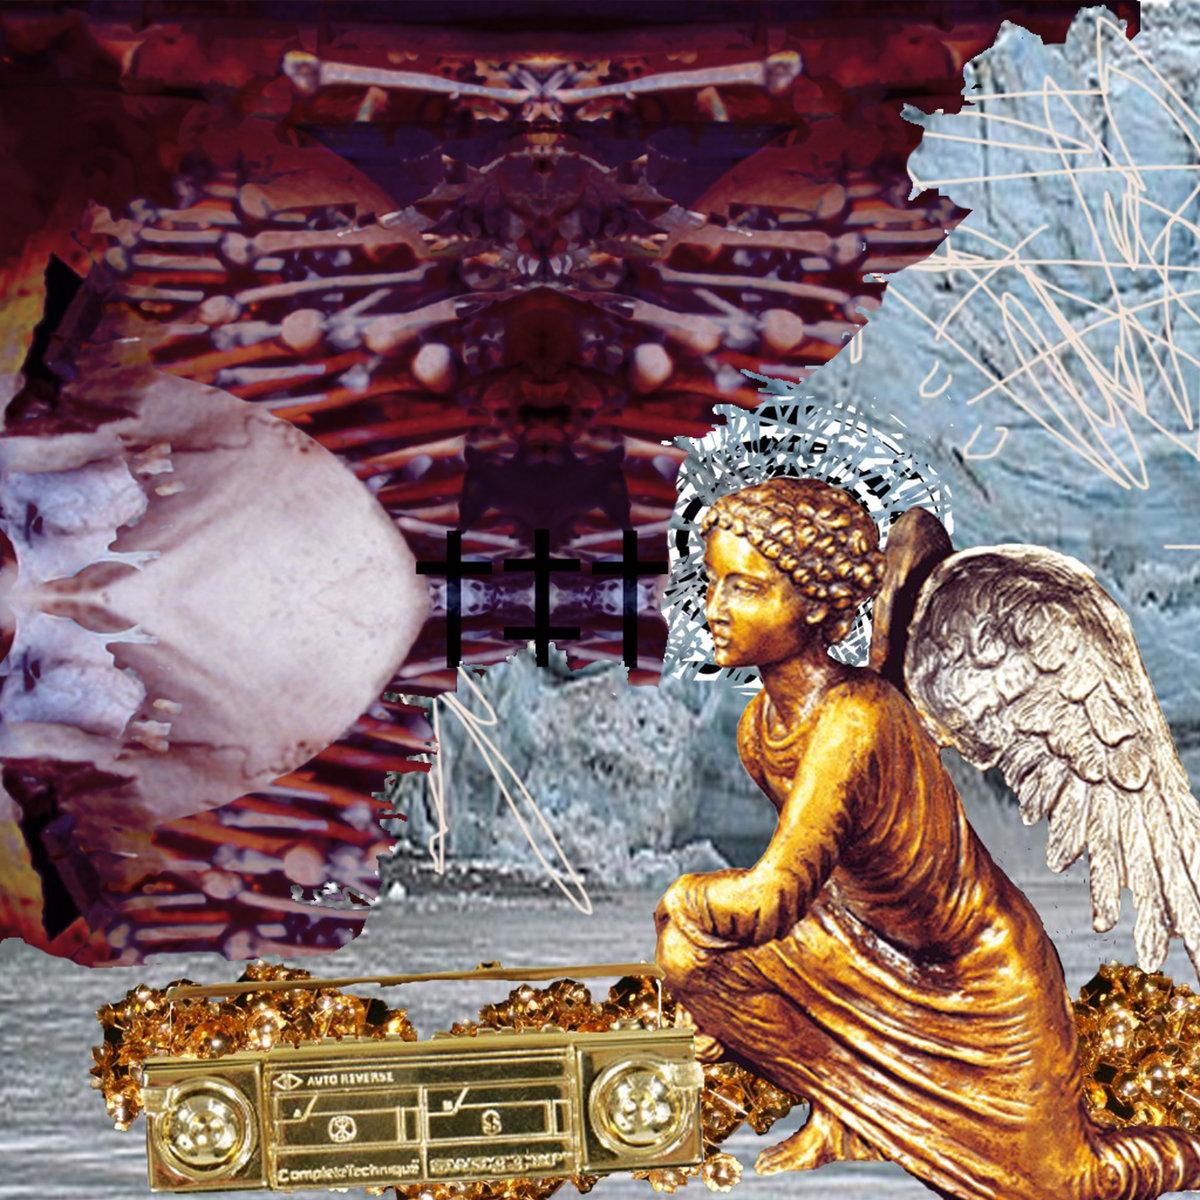 Queen Album Covers Robot Fostercare cover artQueen Album Covers Robot